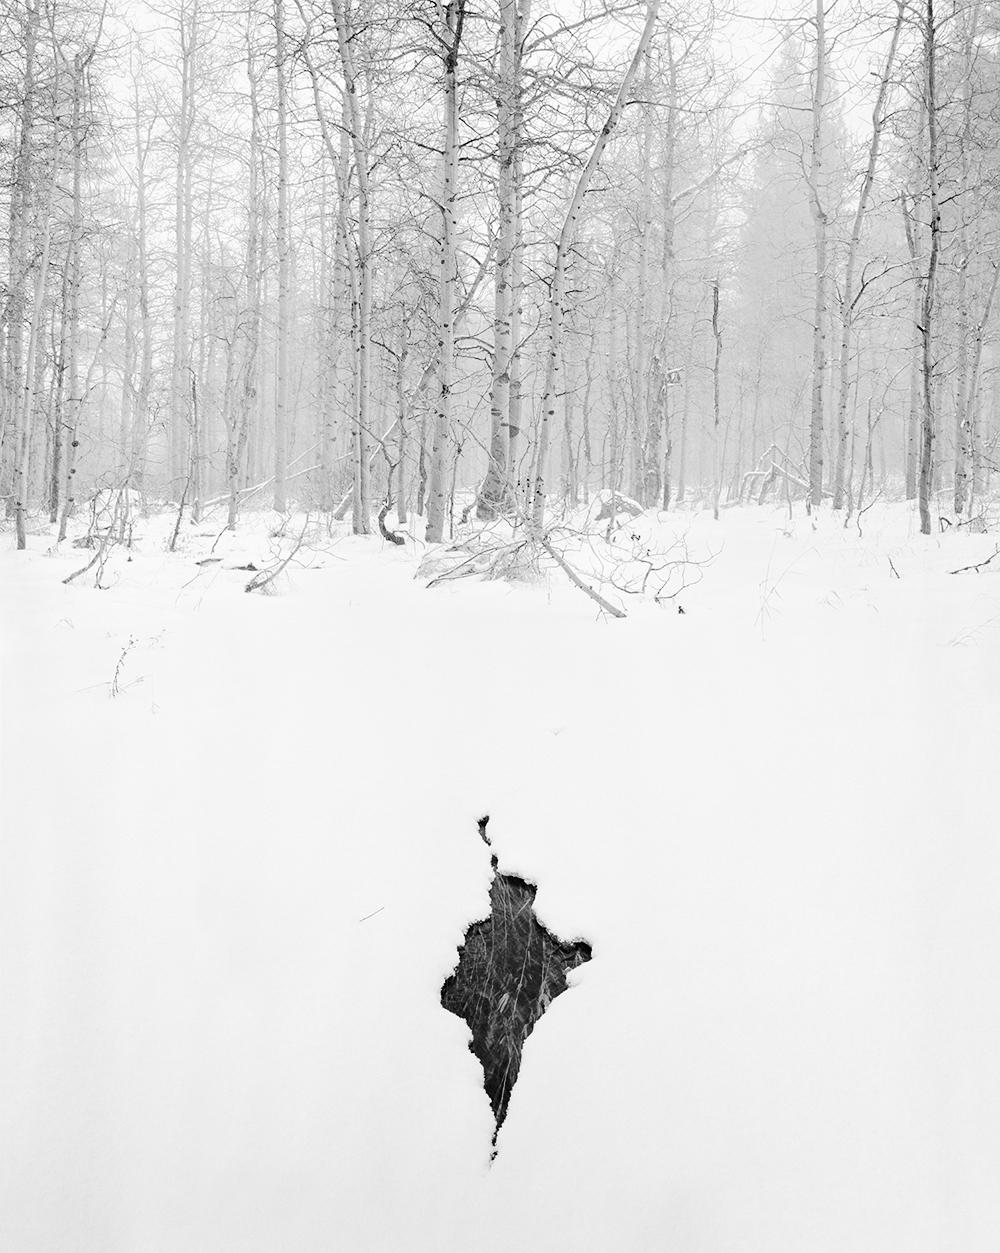 Snowfall, Aspens, crack in snow.jpg